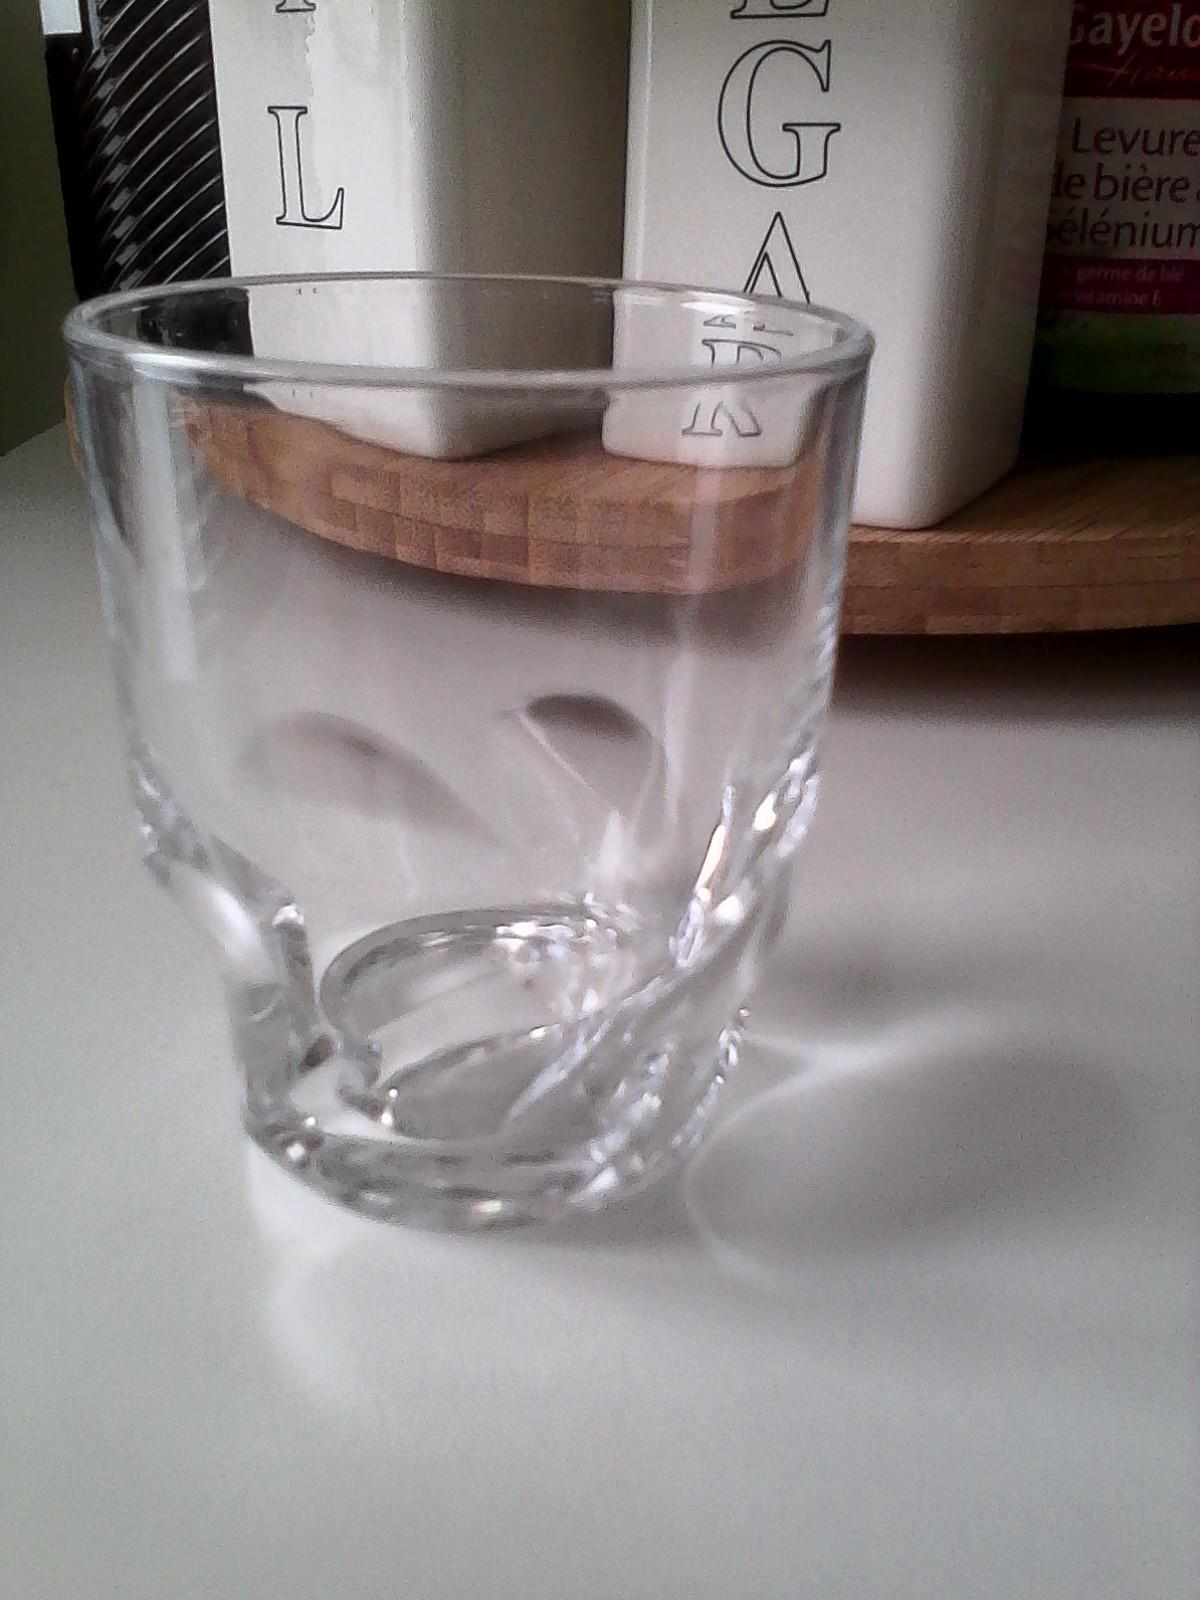 troc de troc verre type cantine x3 image 1